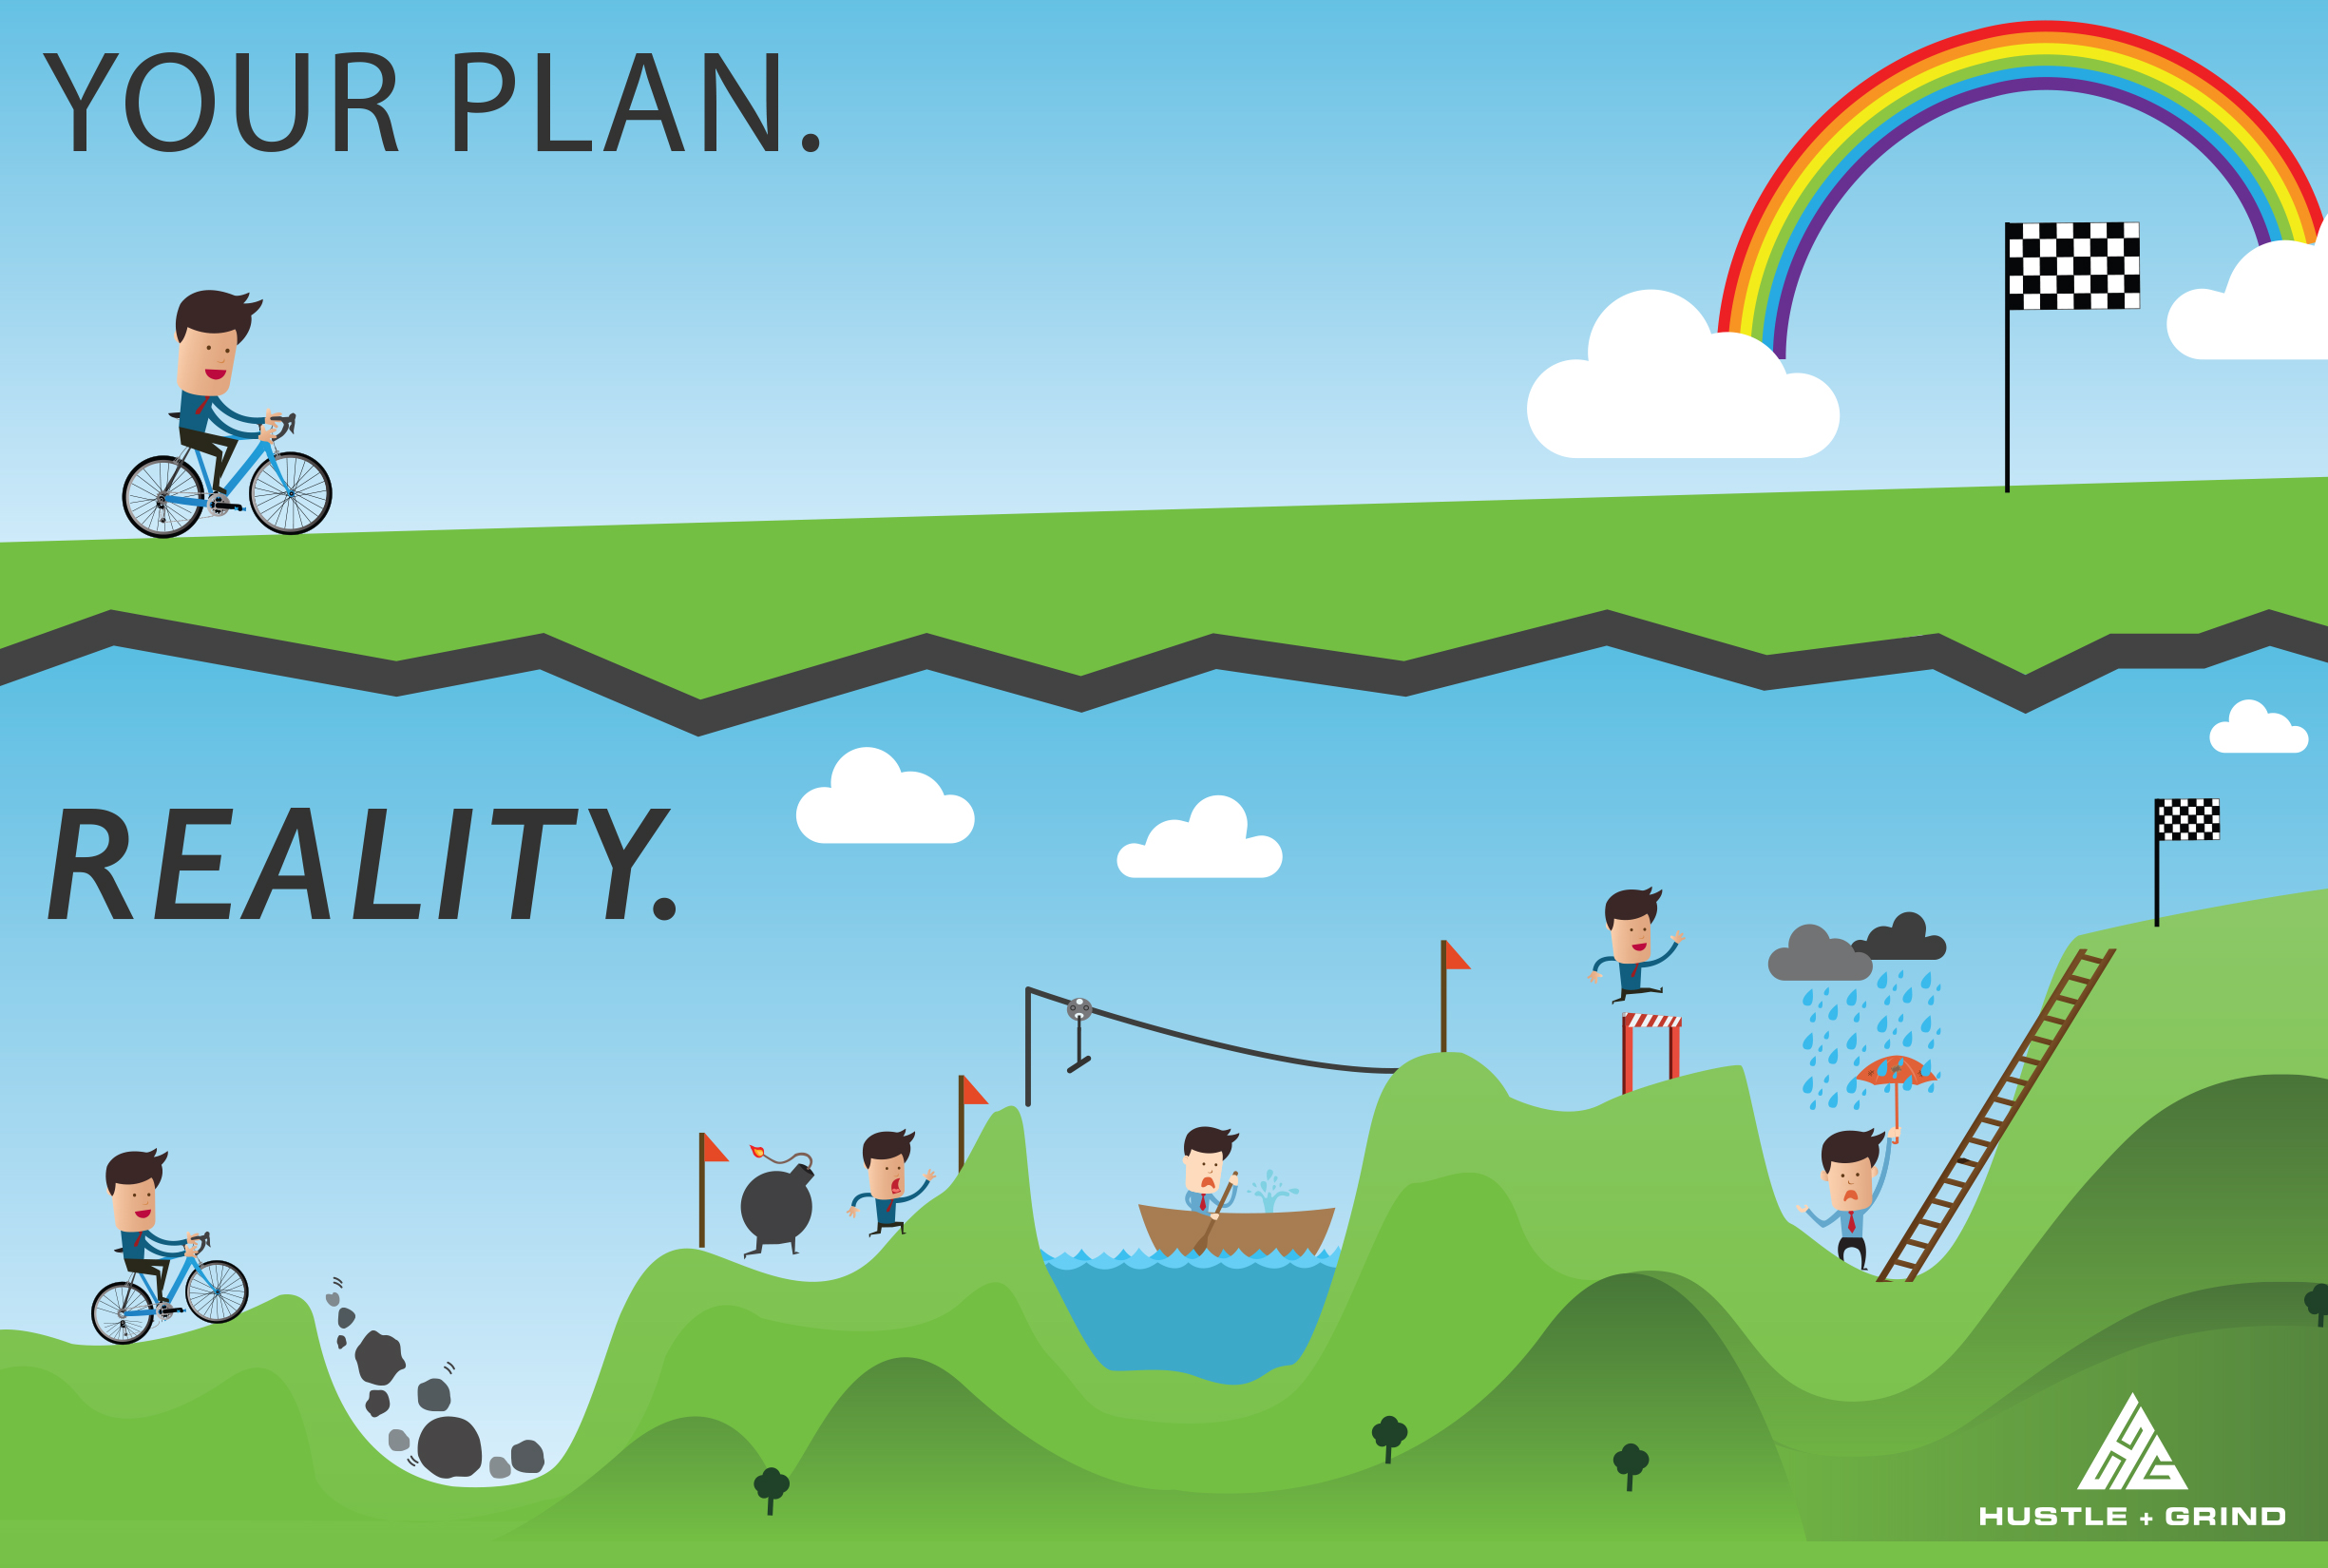 Agile waterfall plan versus reality